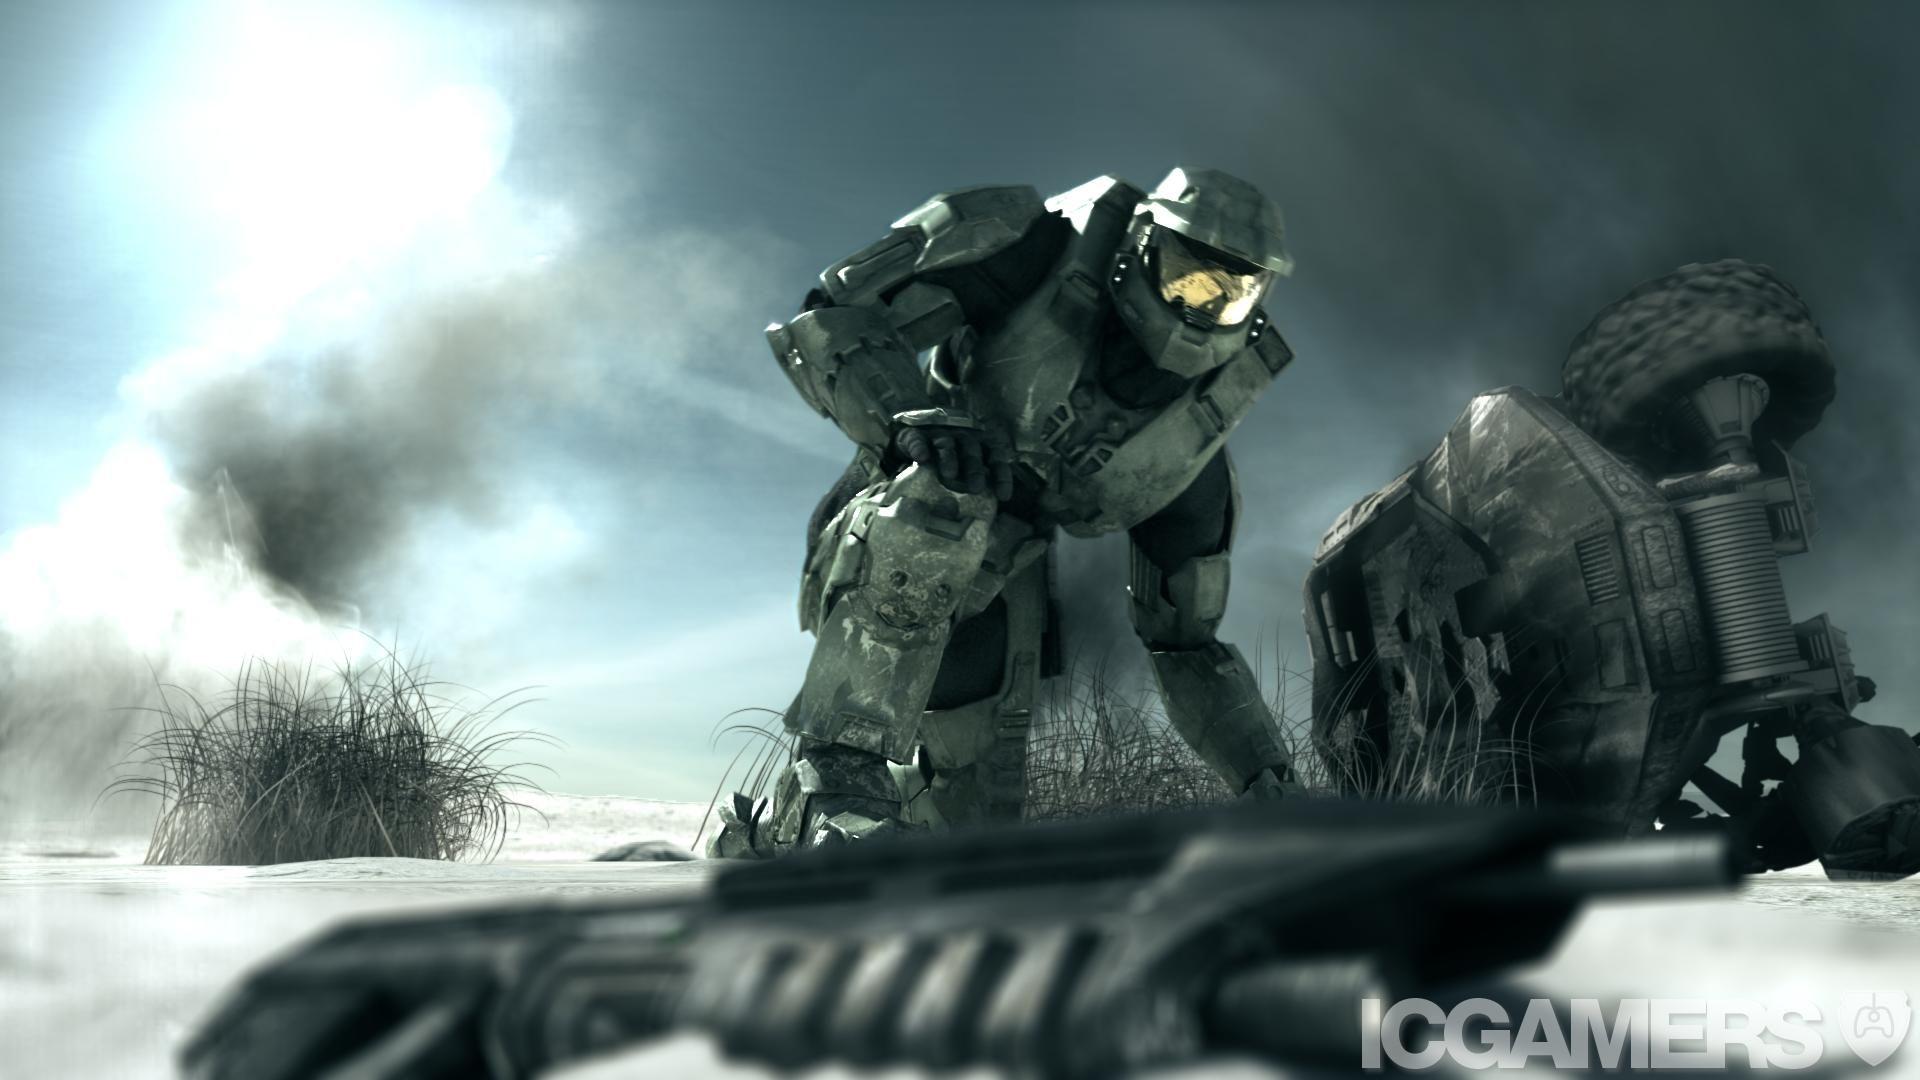 Halo 3 Trailer Pic Halo Halo Game Halo Reach Halo 3